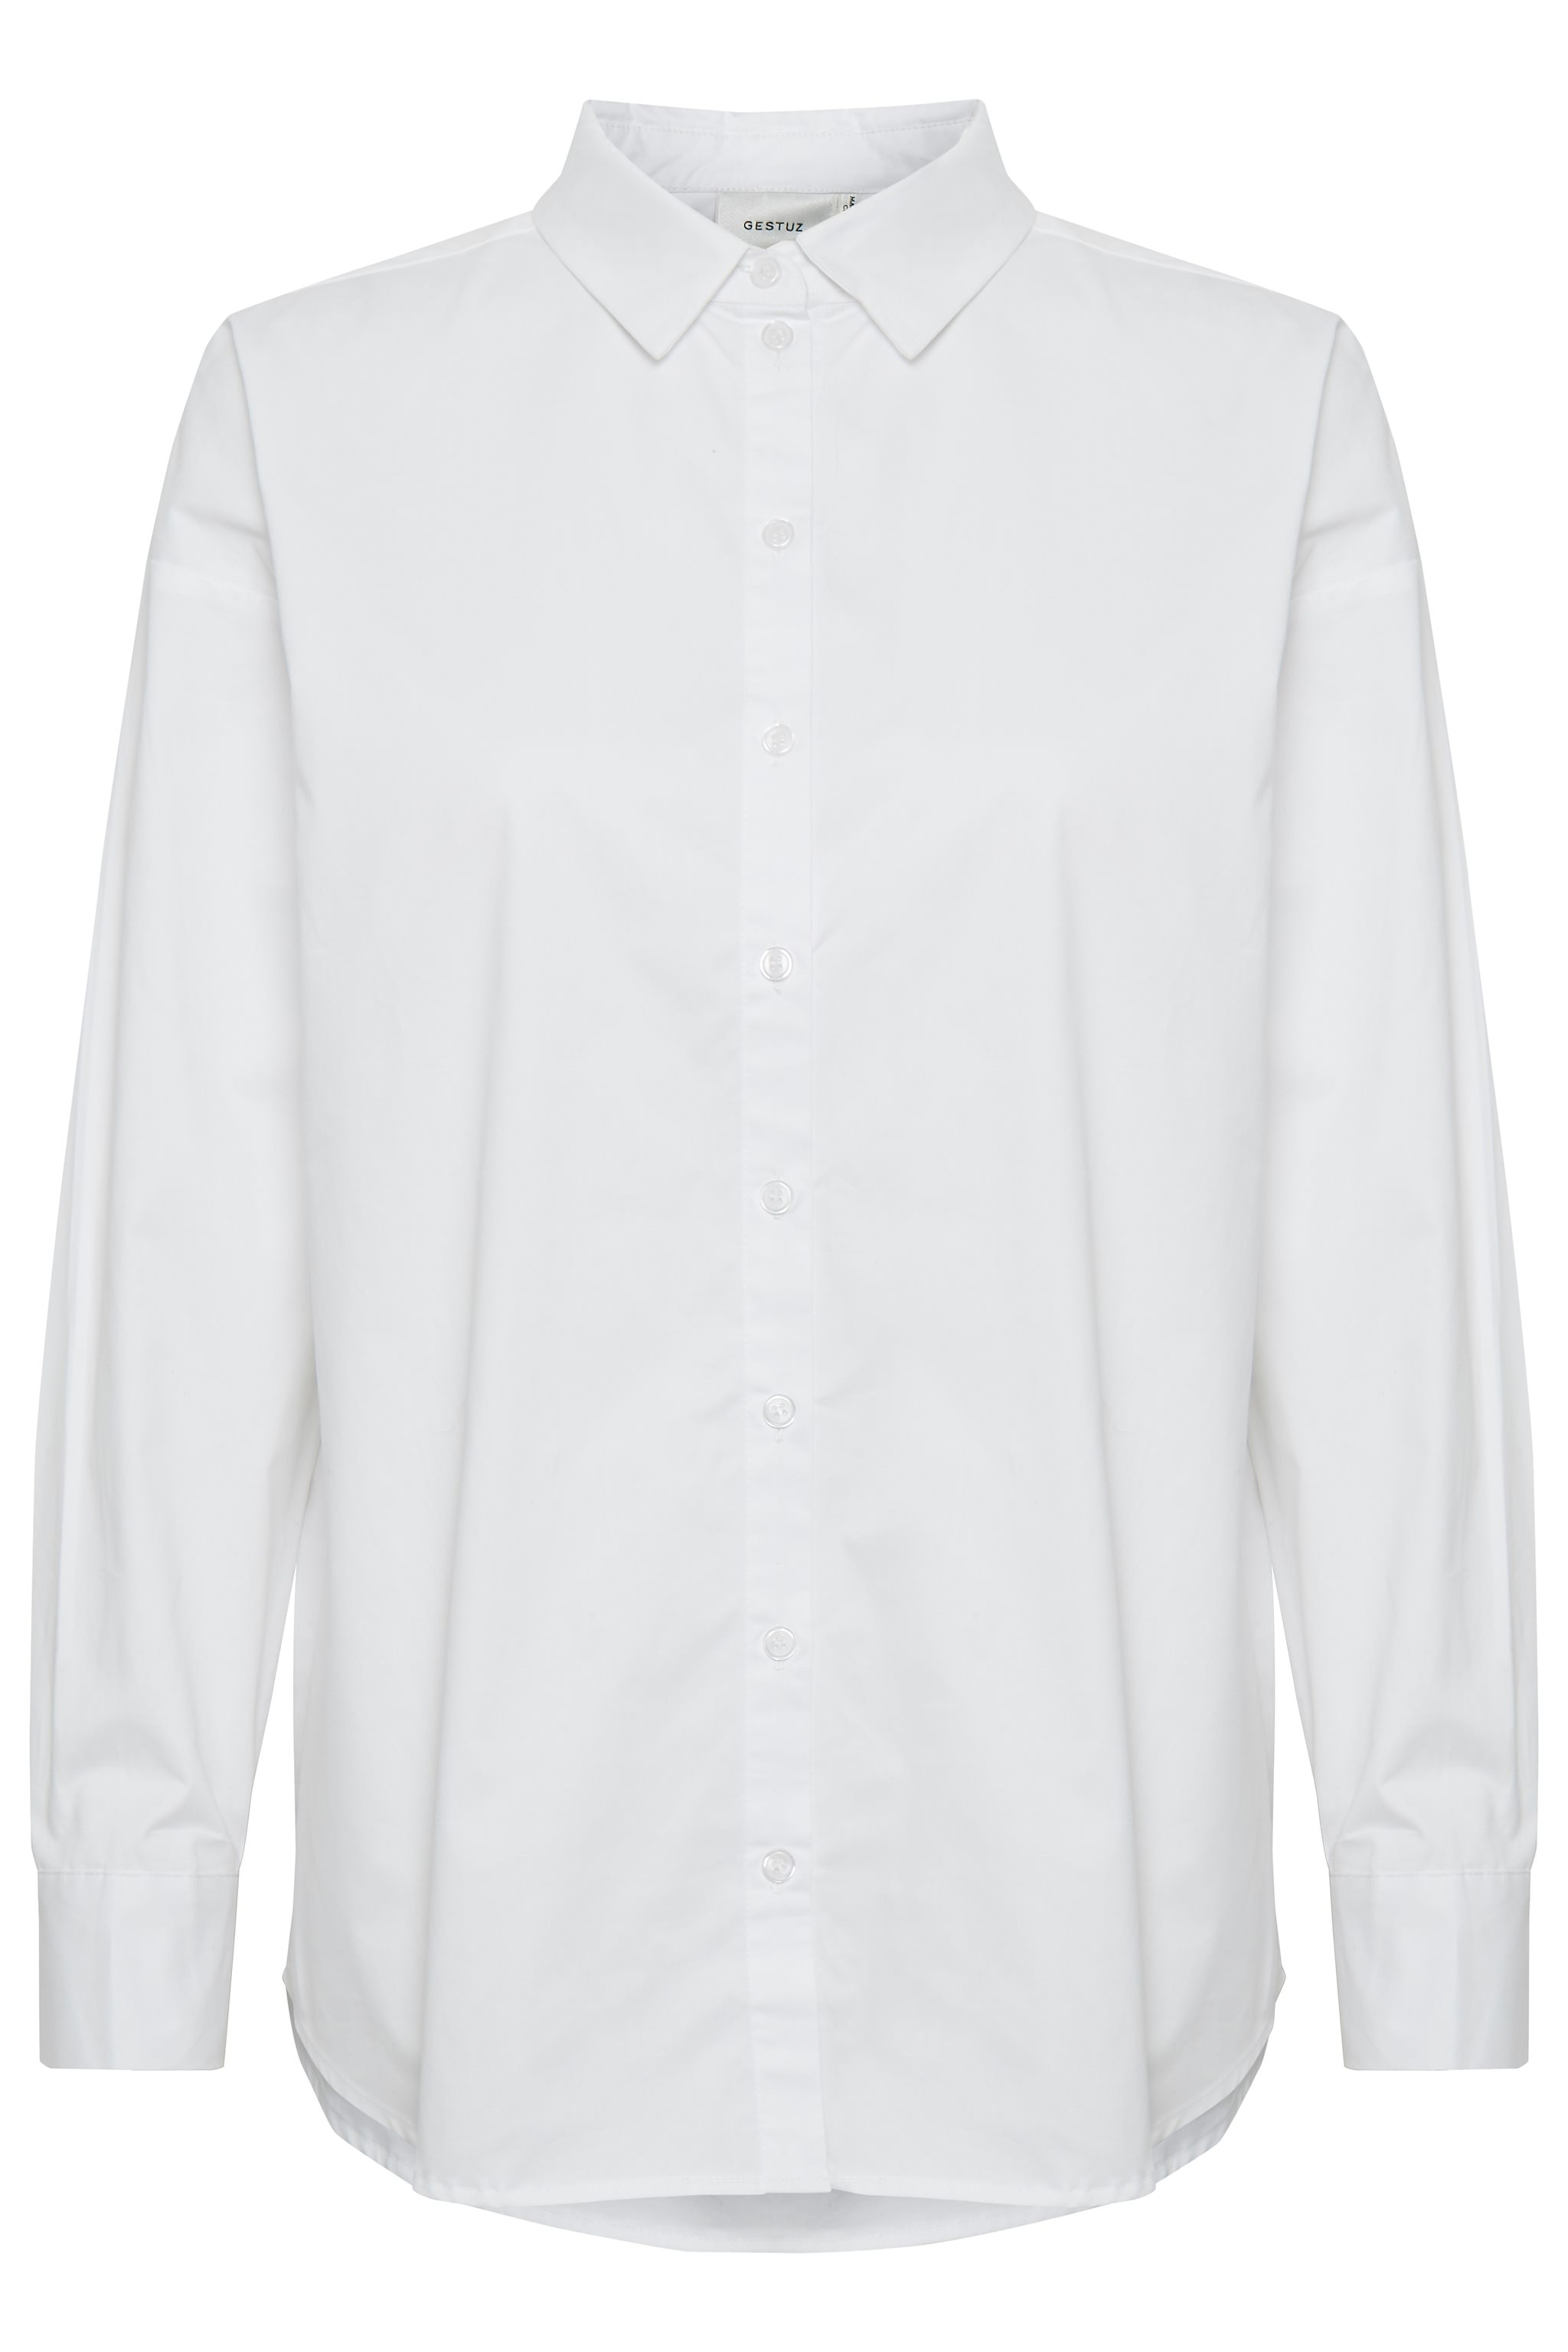 Gestuz Stellagz Long Sleeve Shirt